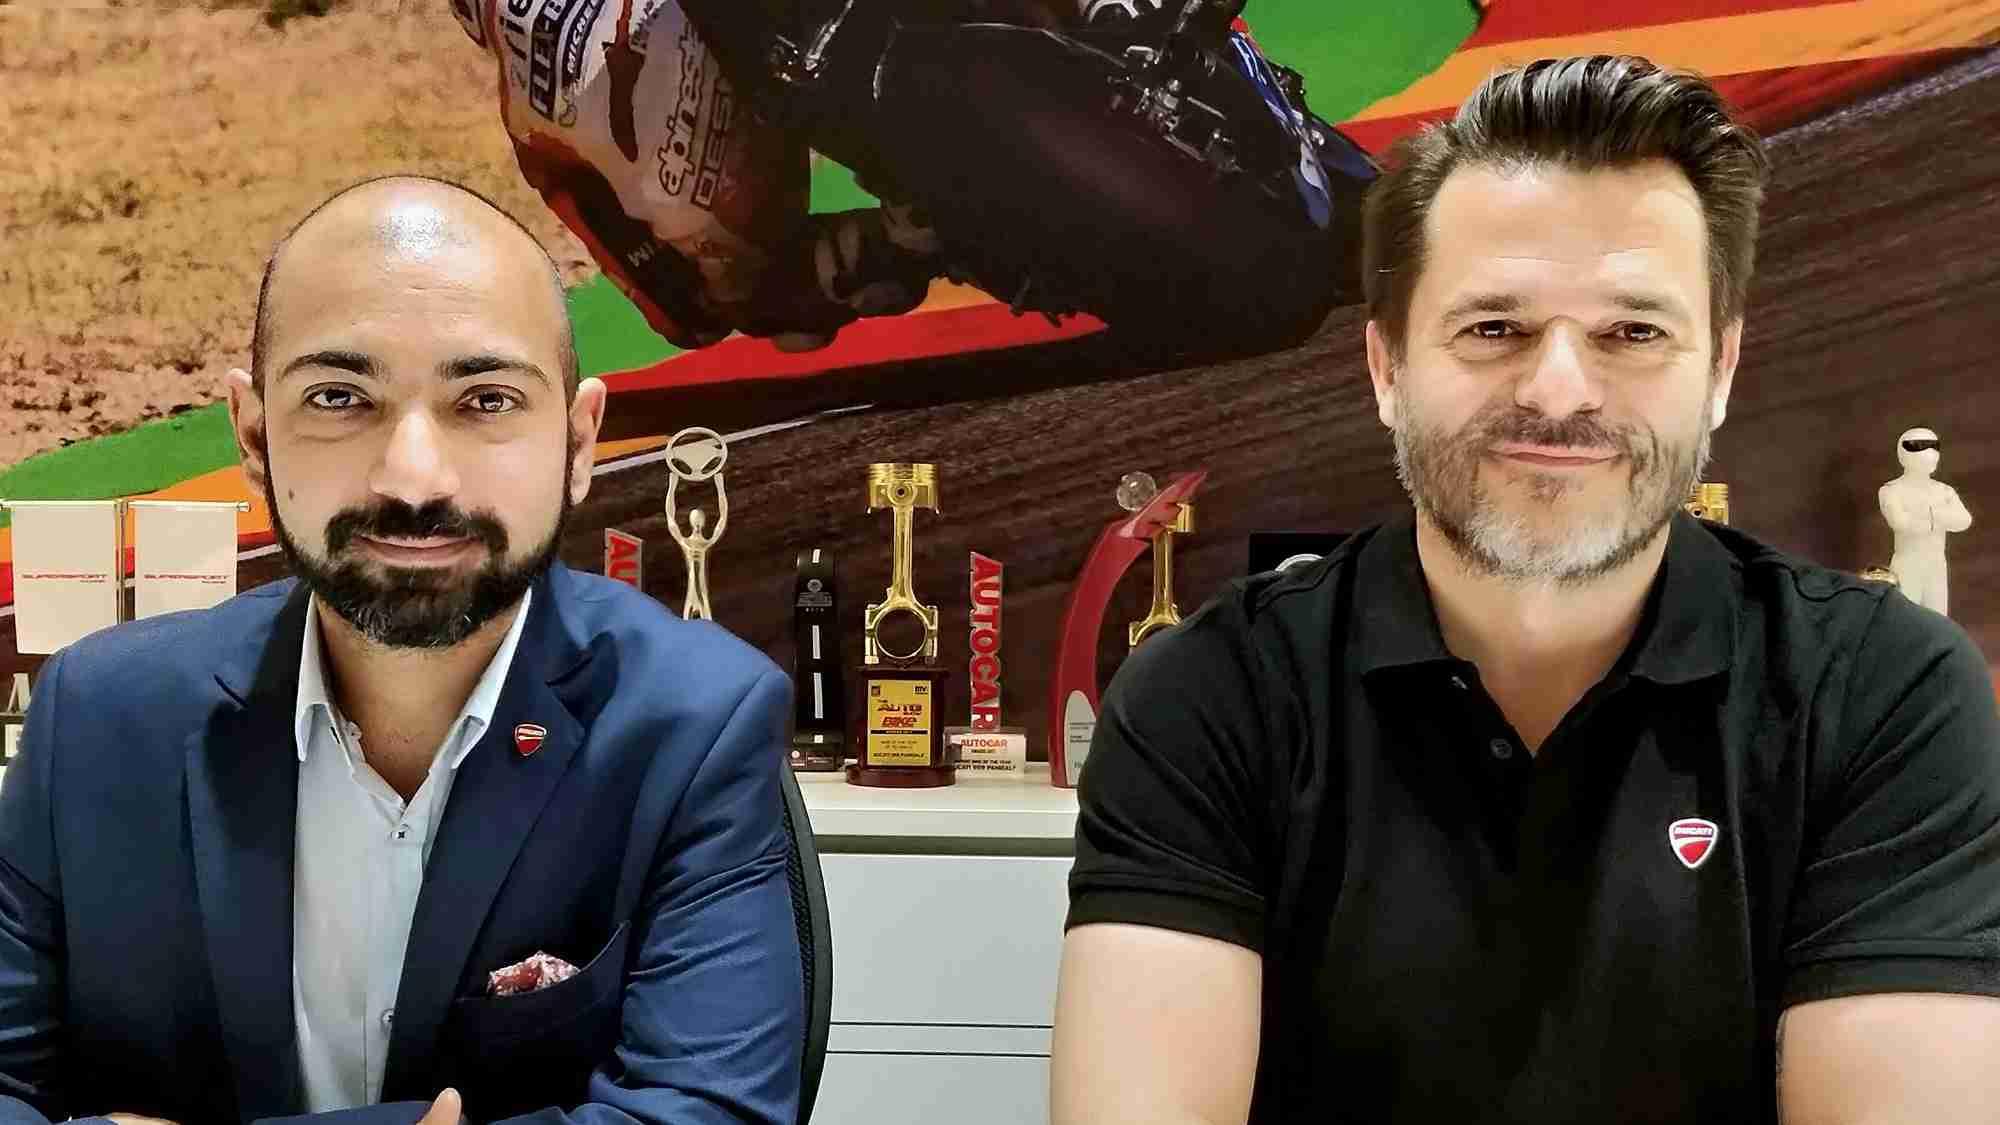 Siddhartha Varma, Director - Marketing with Sergi Canovas, Managing Director, Ducati India